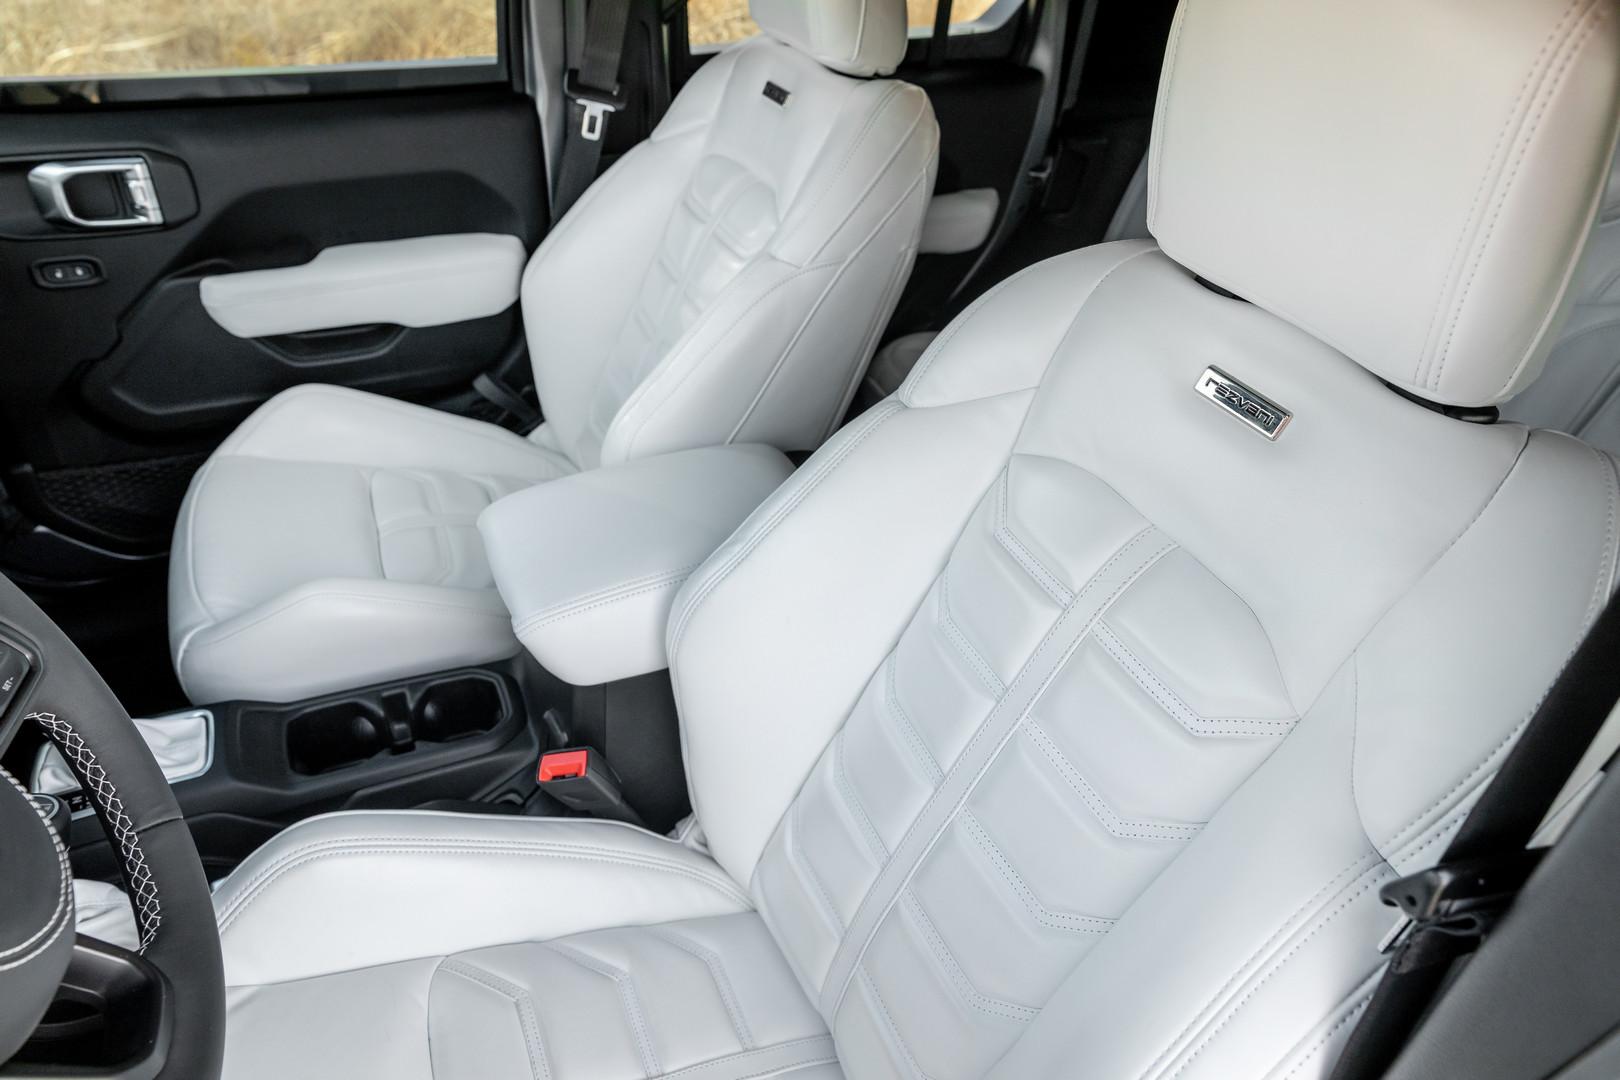 rezvani tank interior seats